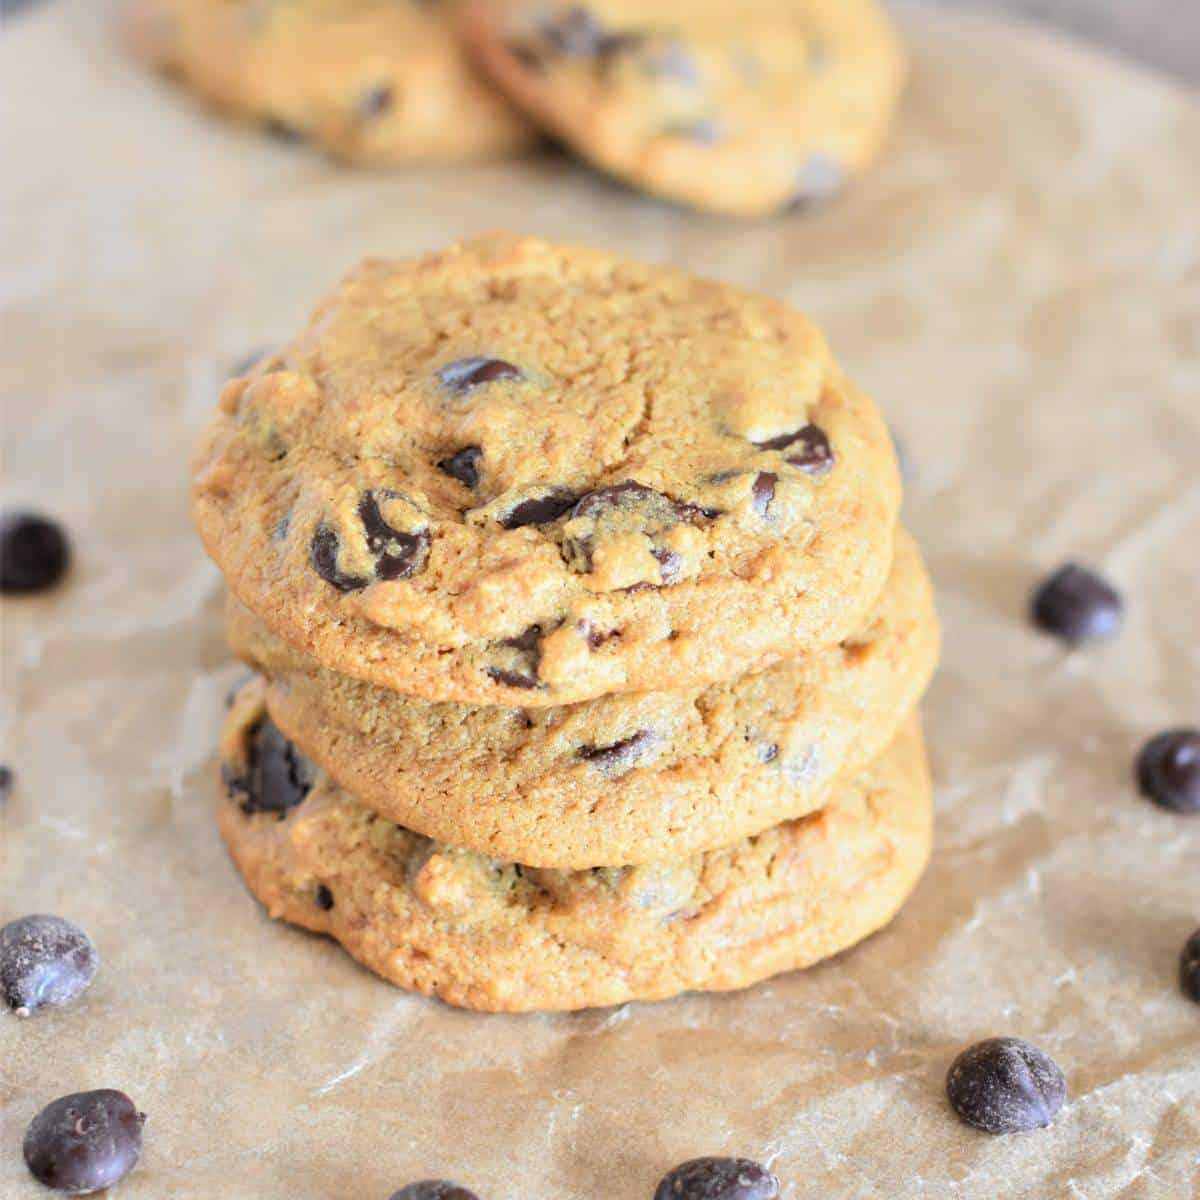 Vegan Gluten Free Chickpea Flour Chocolate Chip Cookies